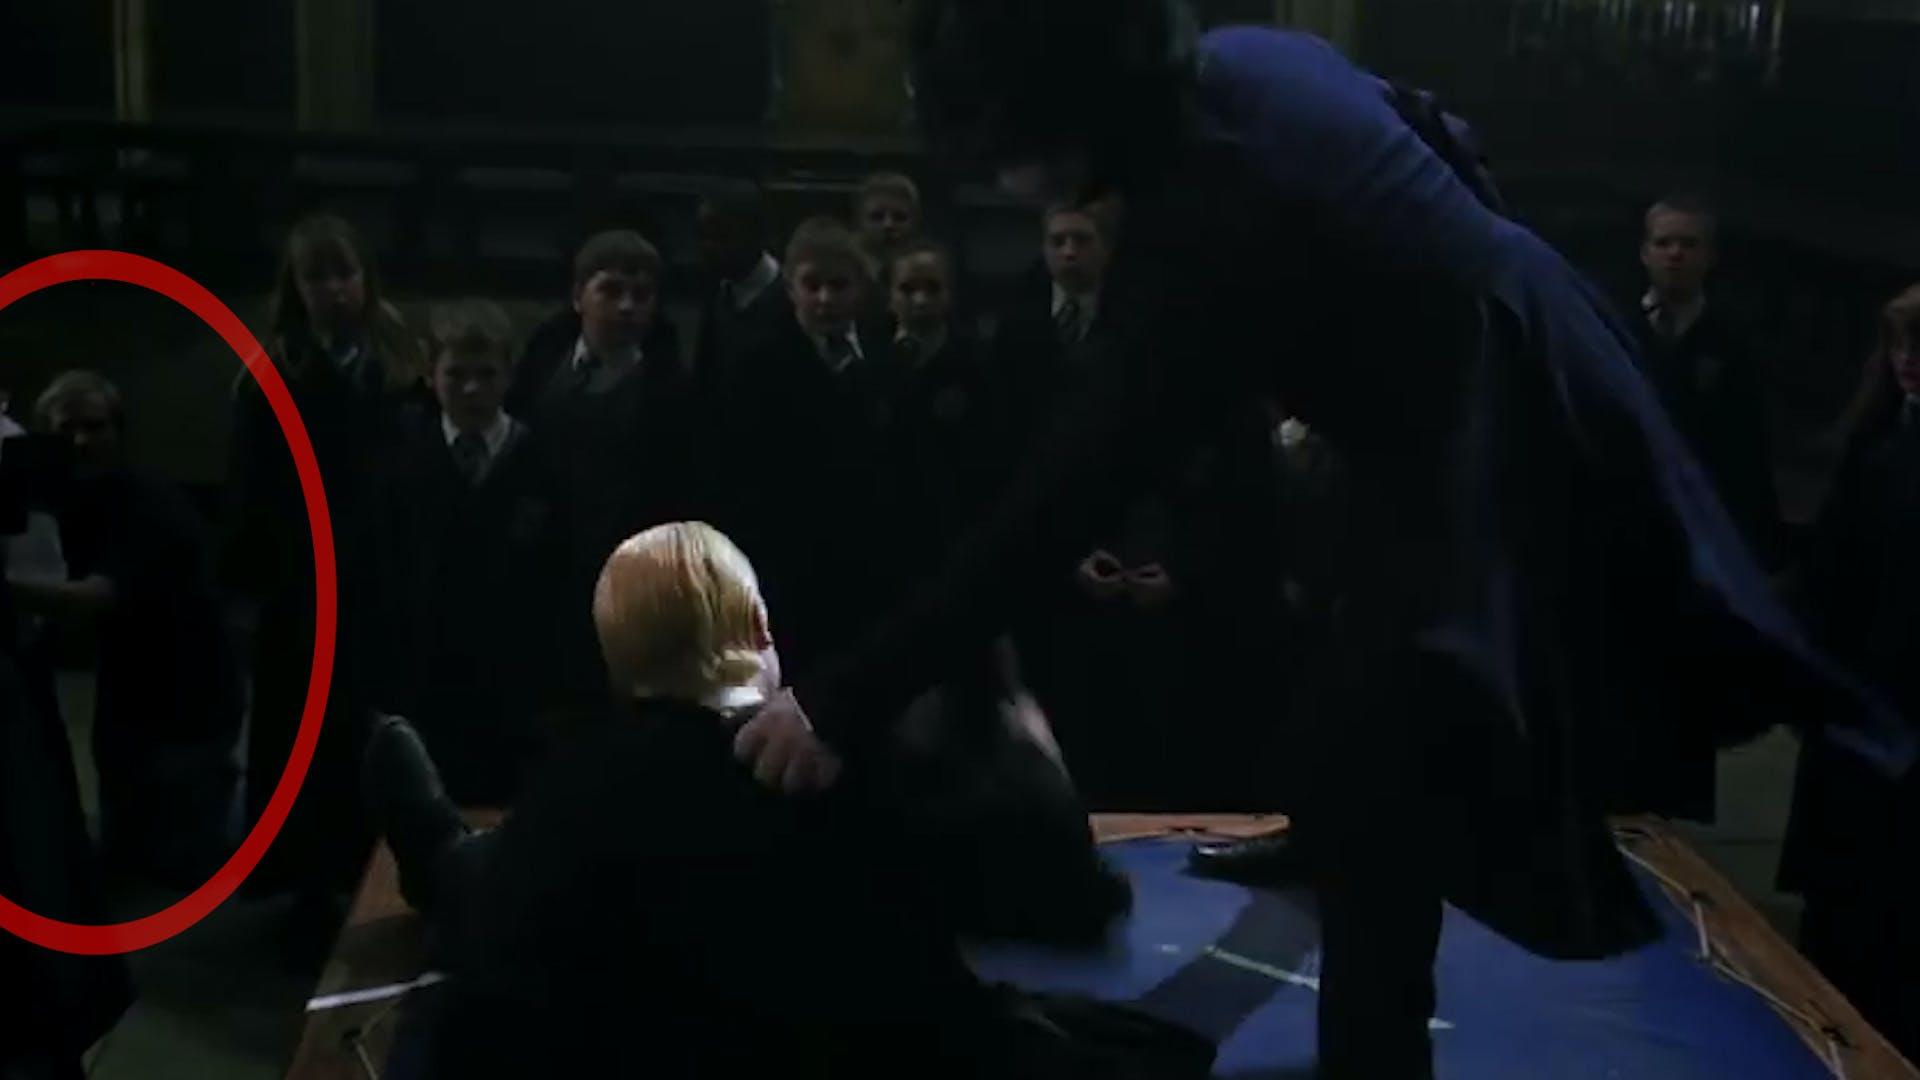 Harry Potter Camera man